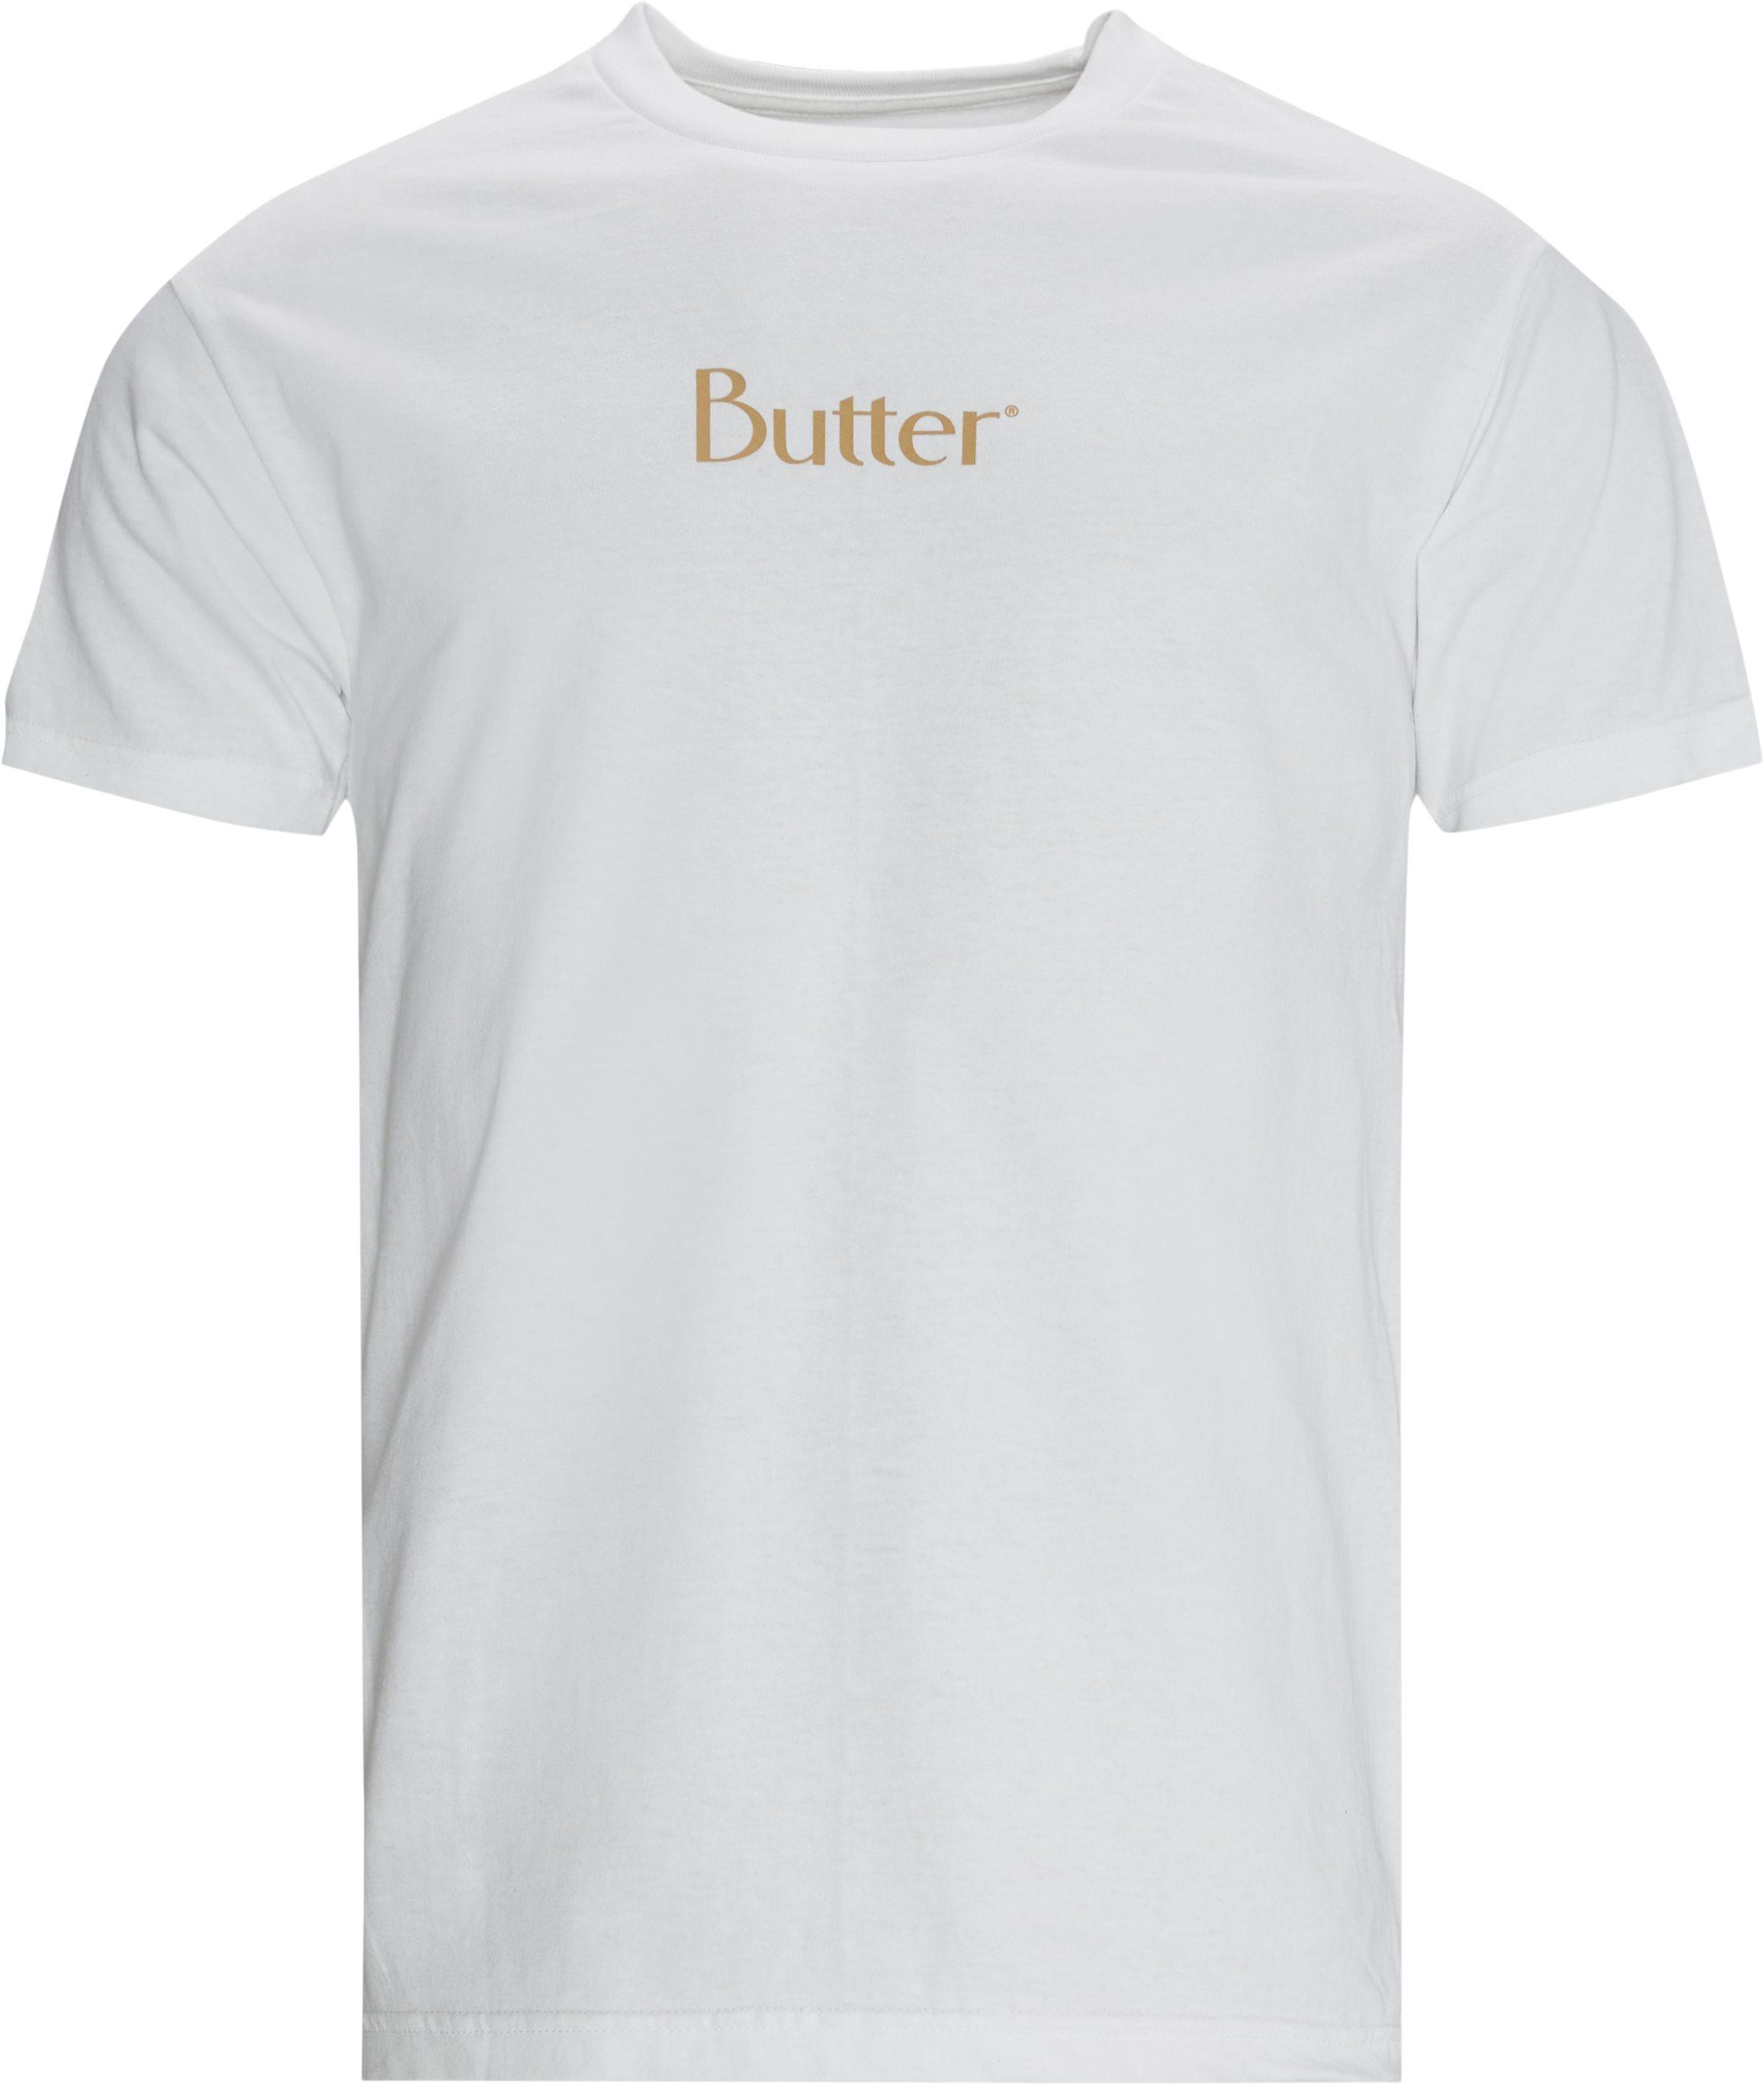 CLASSIC LOGO t-shirt - T-shirts - Regular fit - Hvid